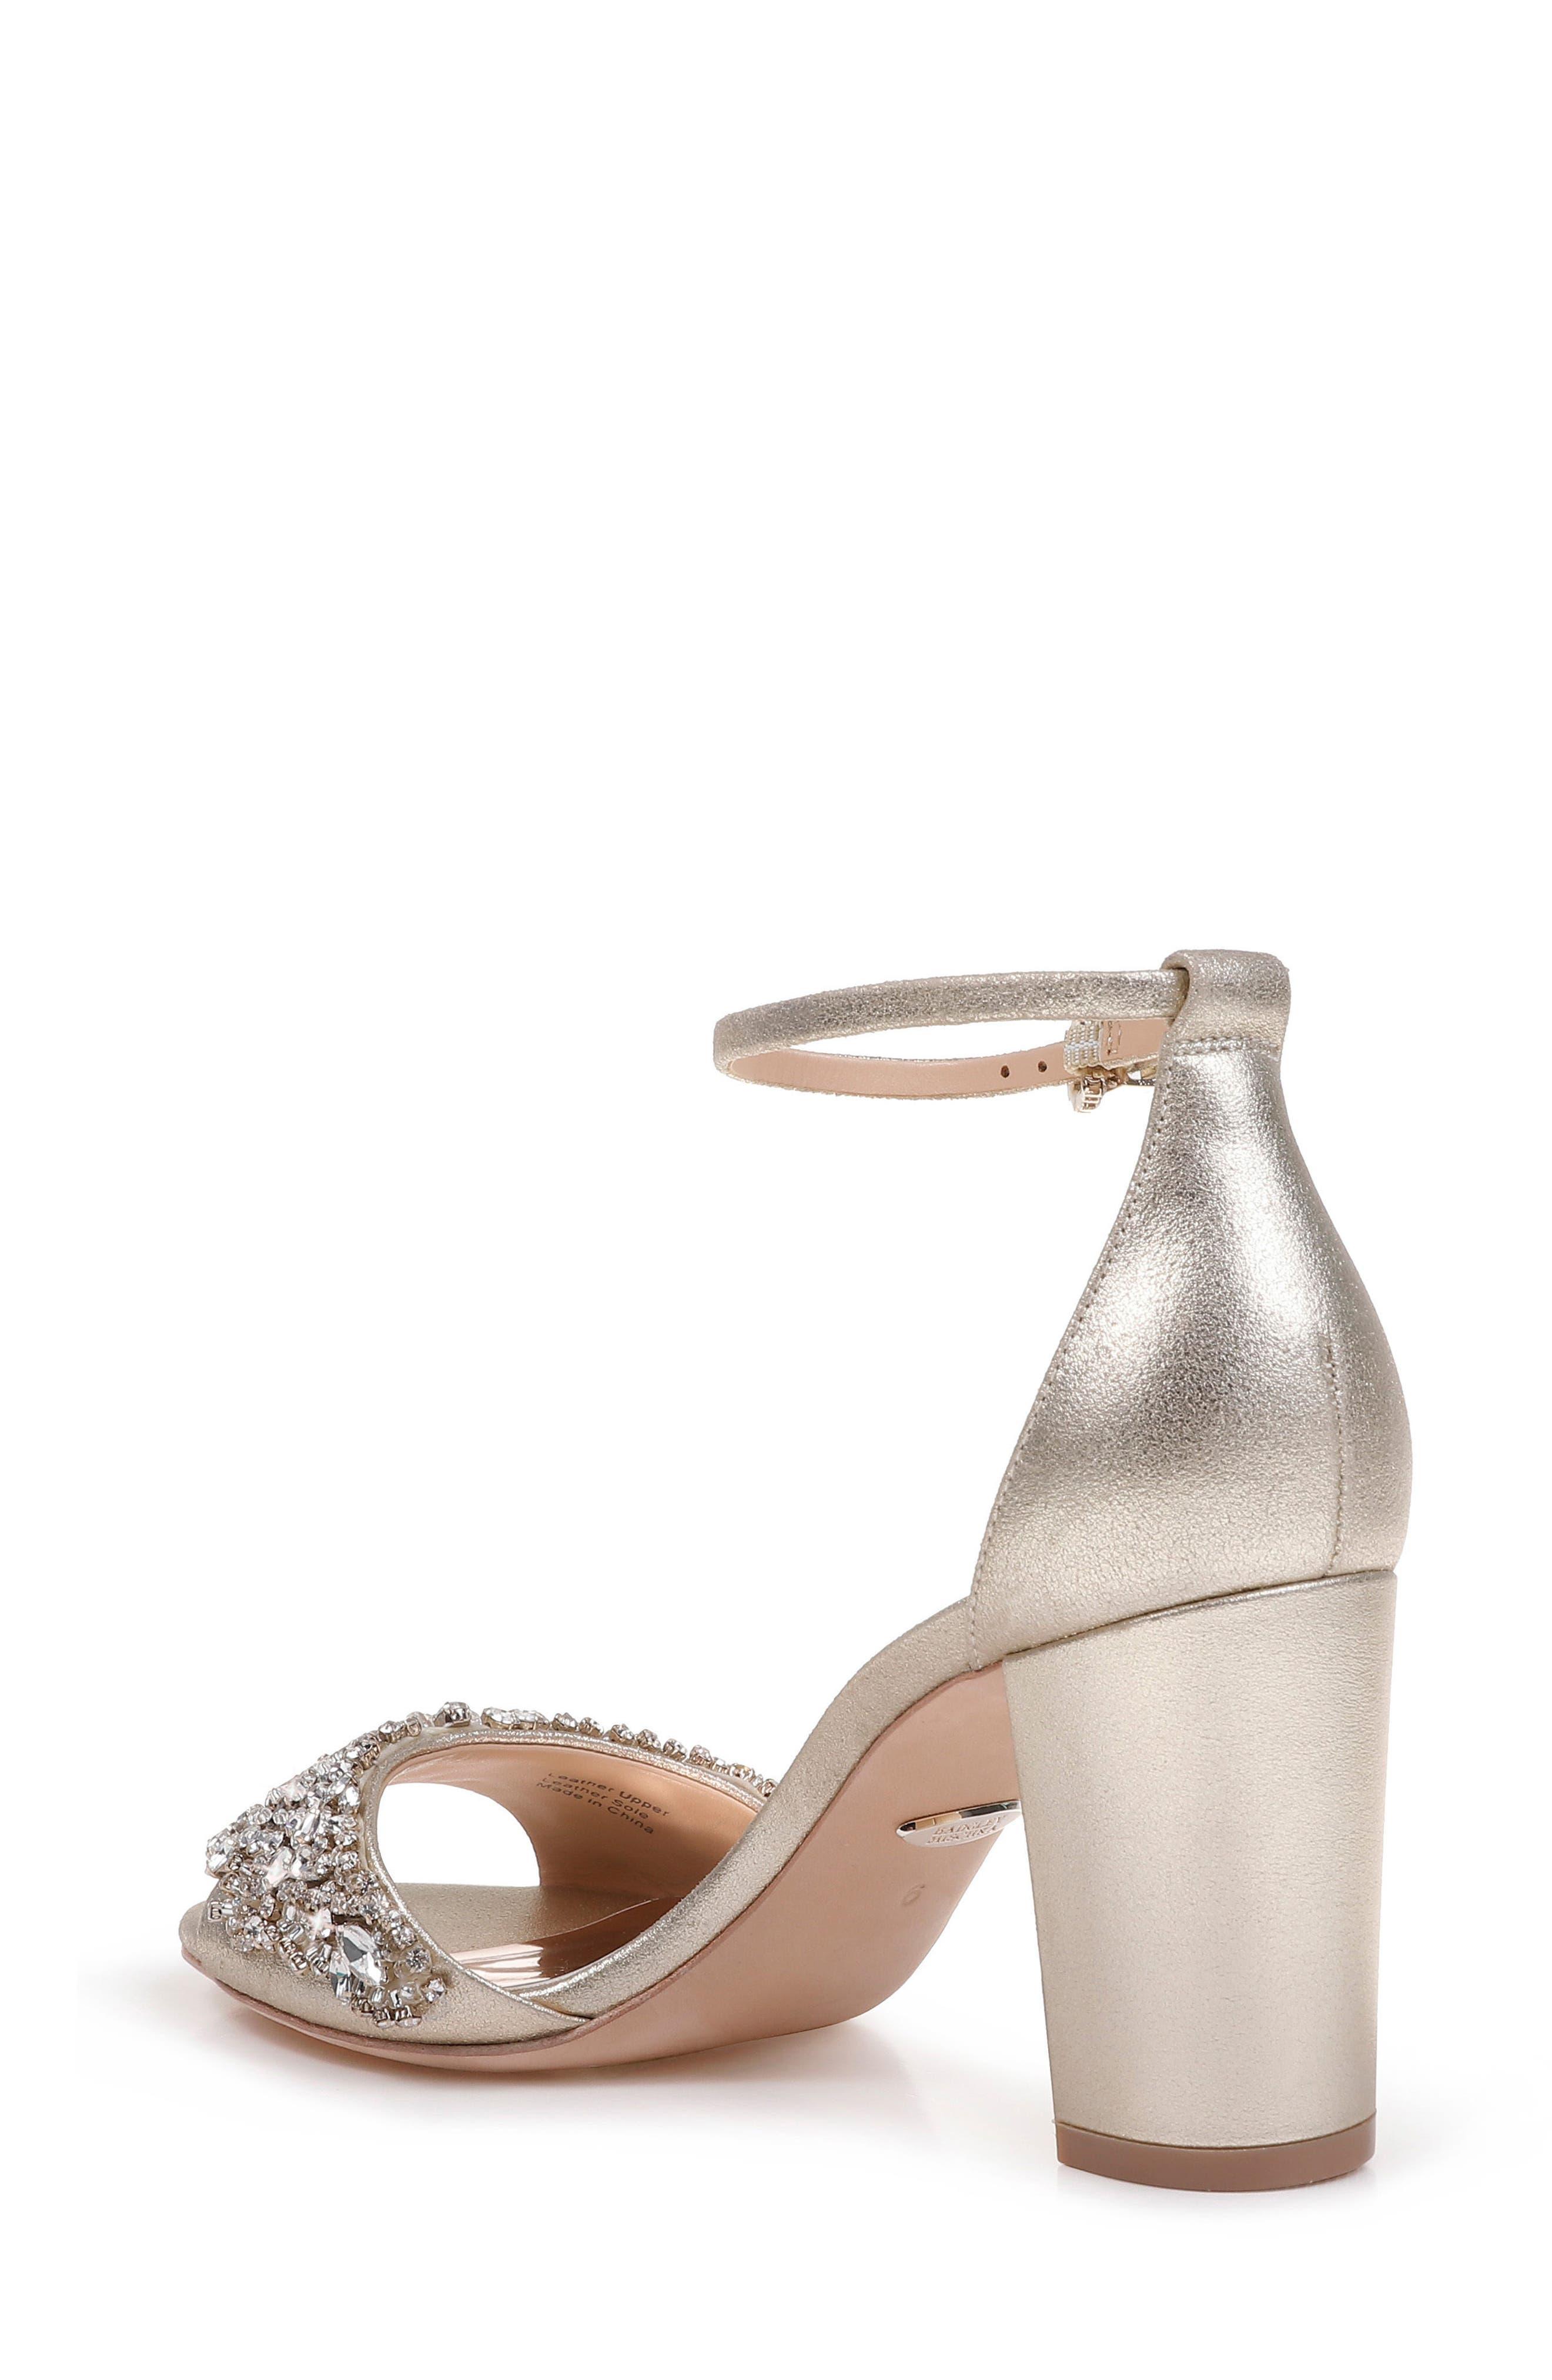 Hines Embellished Block Heel Sandal,                             Alternate thumbnail 2, color,                             040